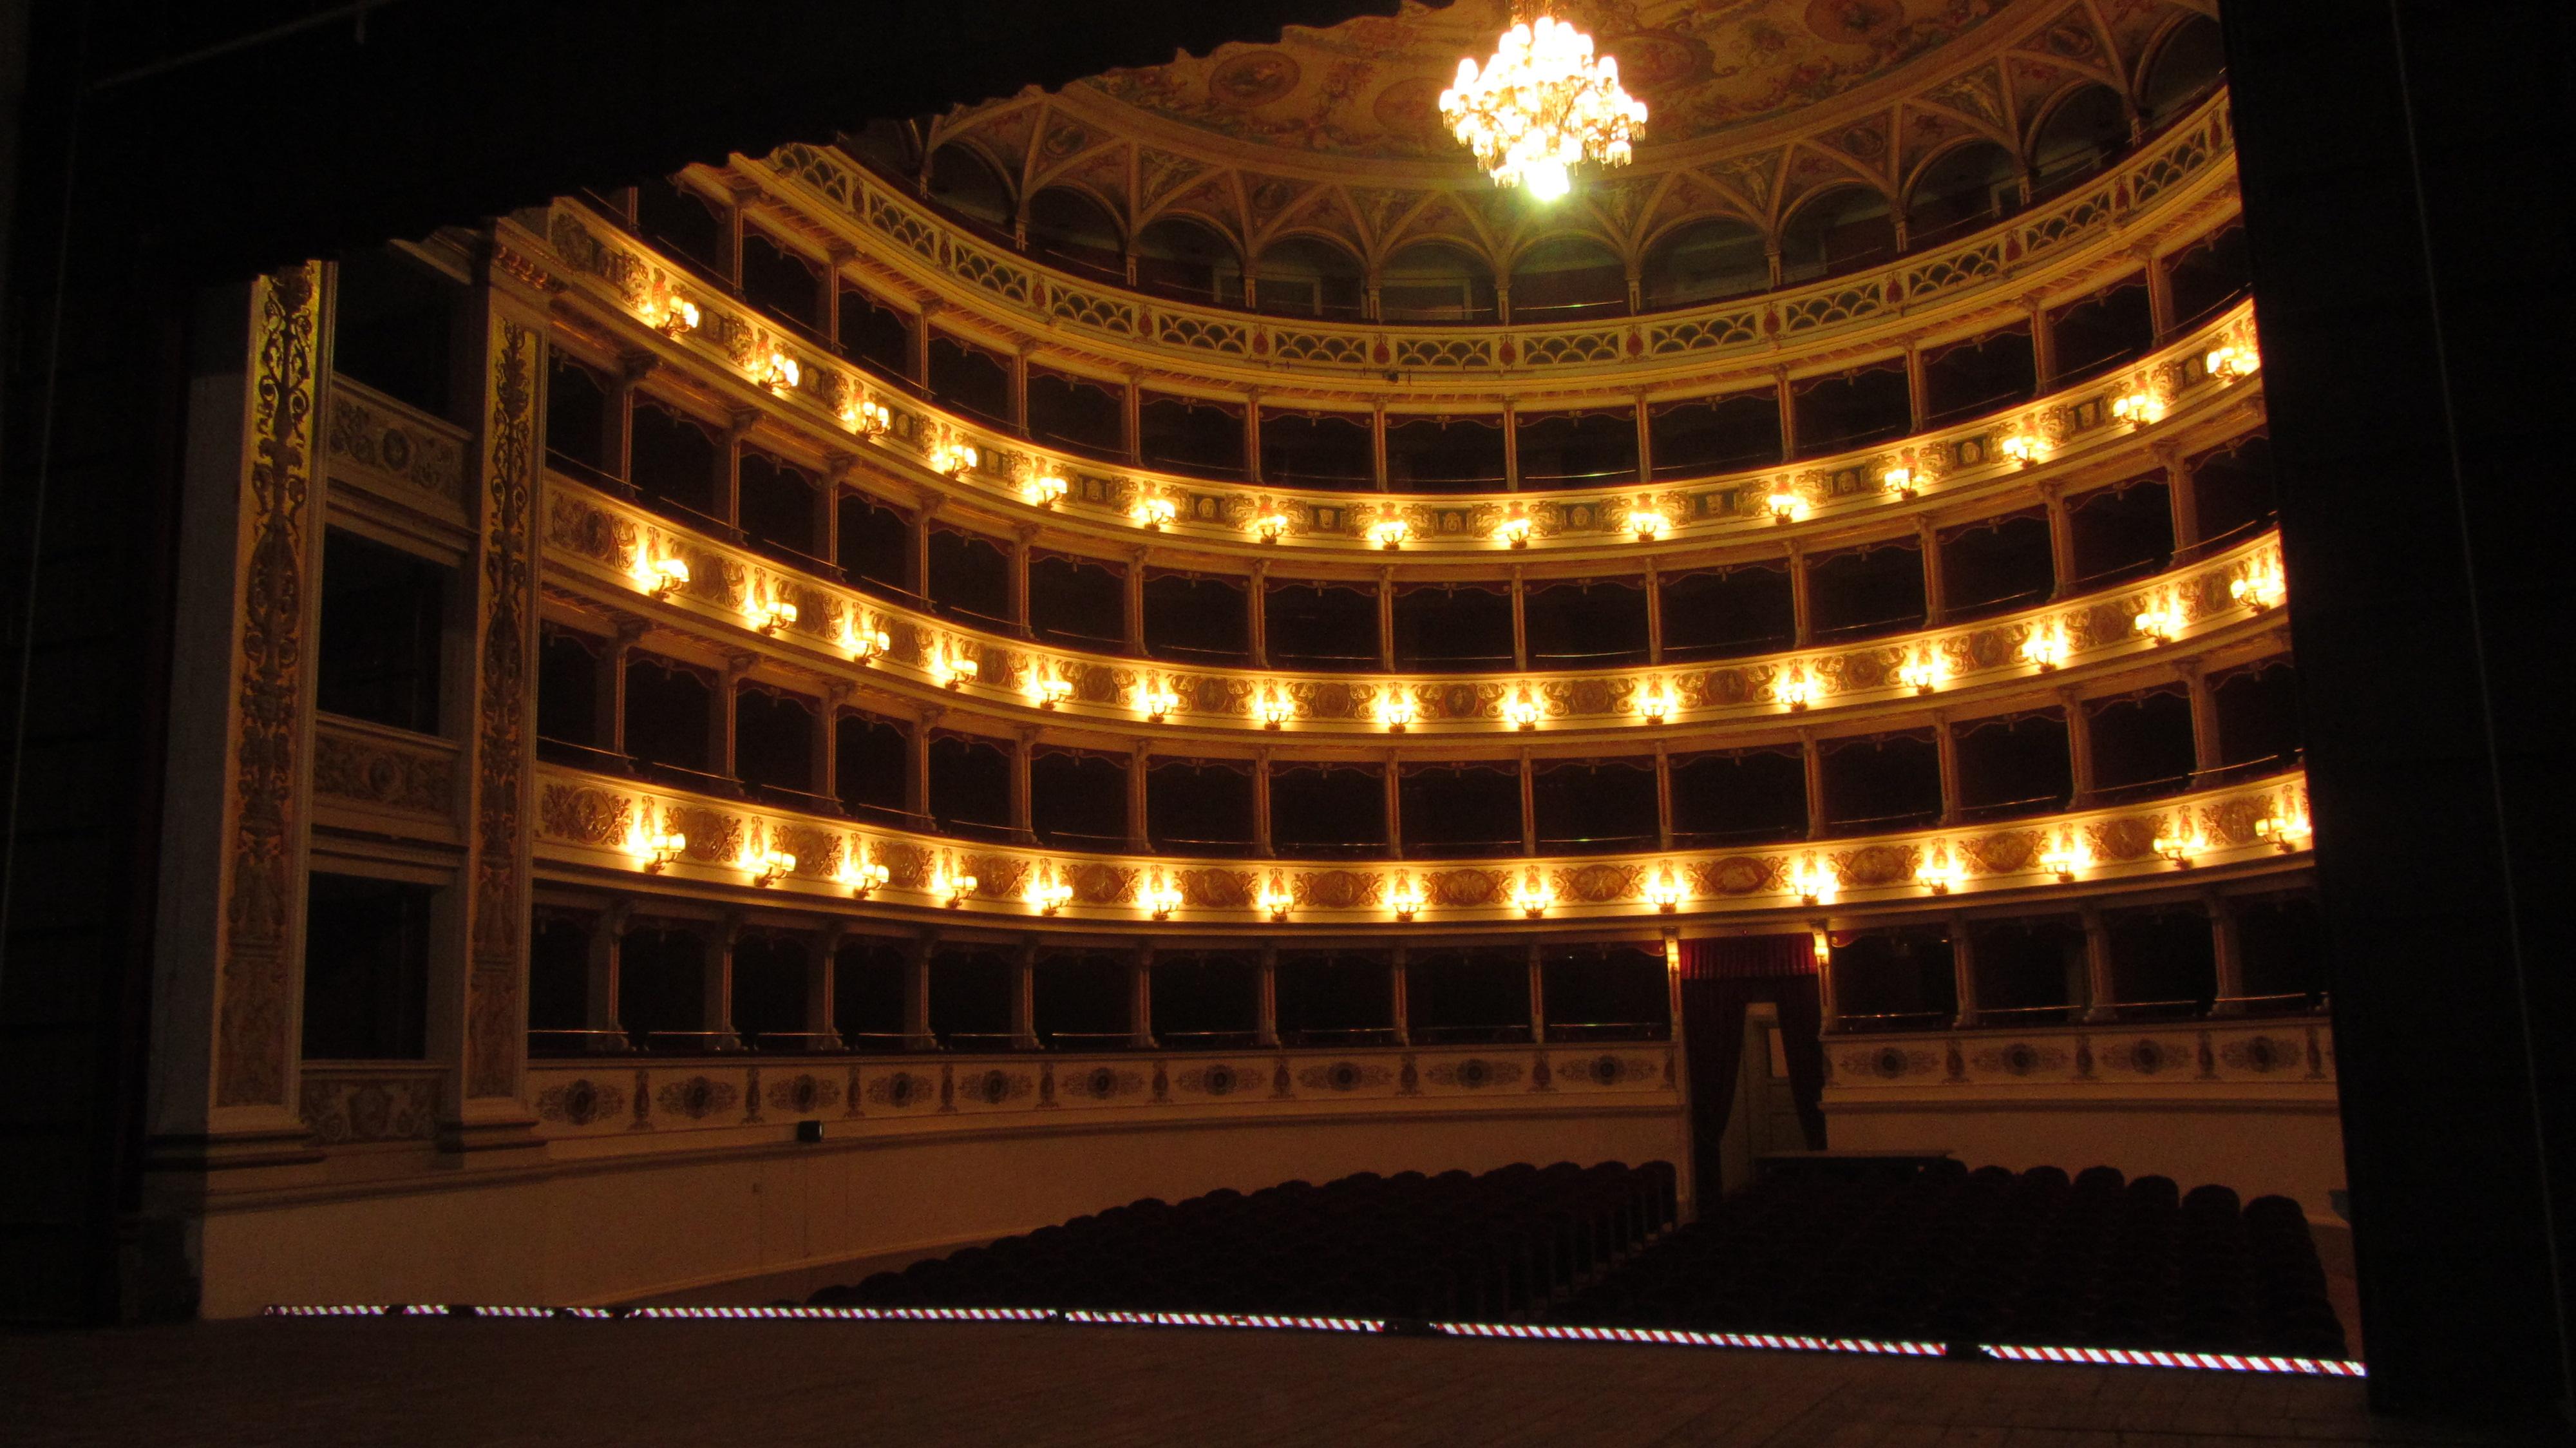 File:Teatro Nuovo Gian Carlo Menotti.JPG - Wikipedia